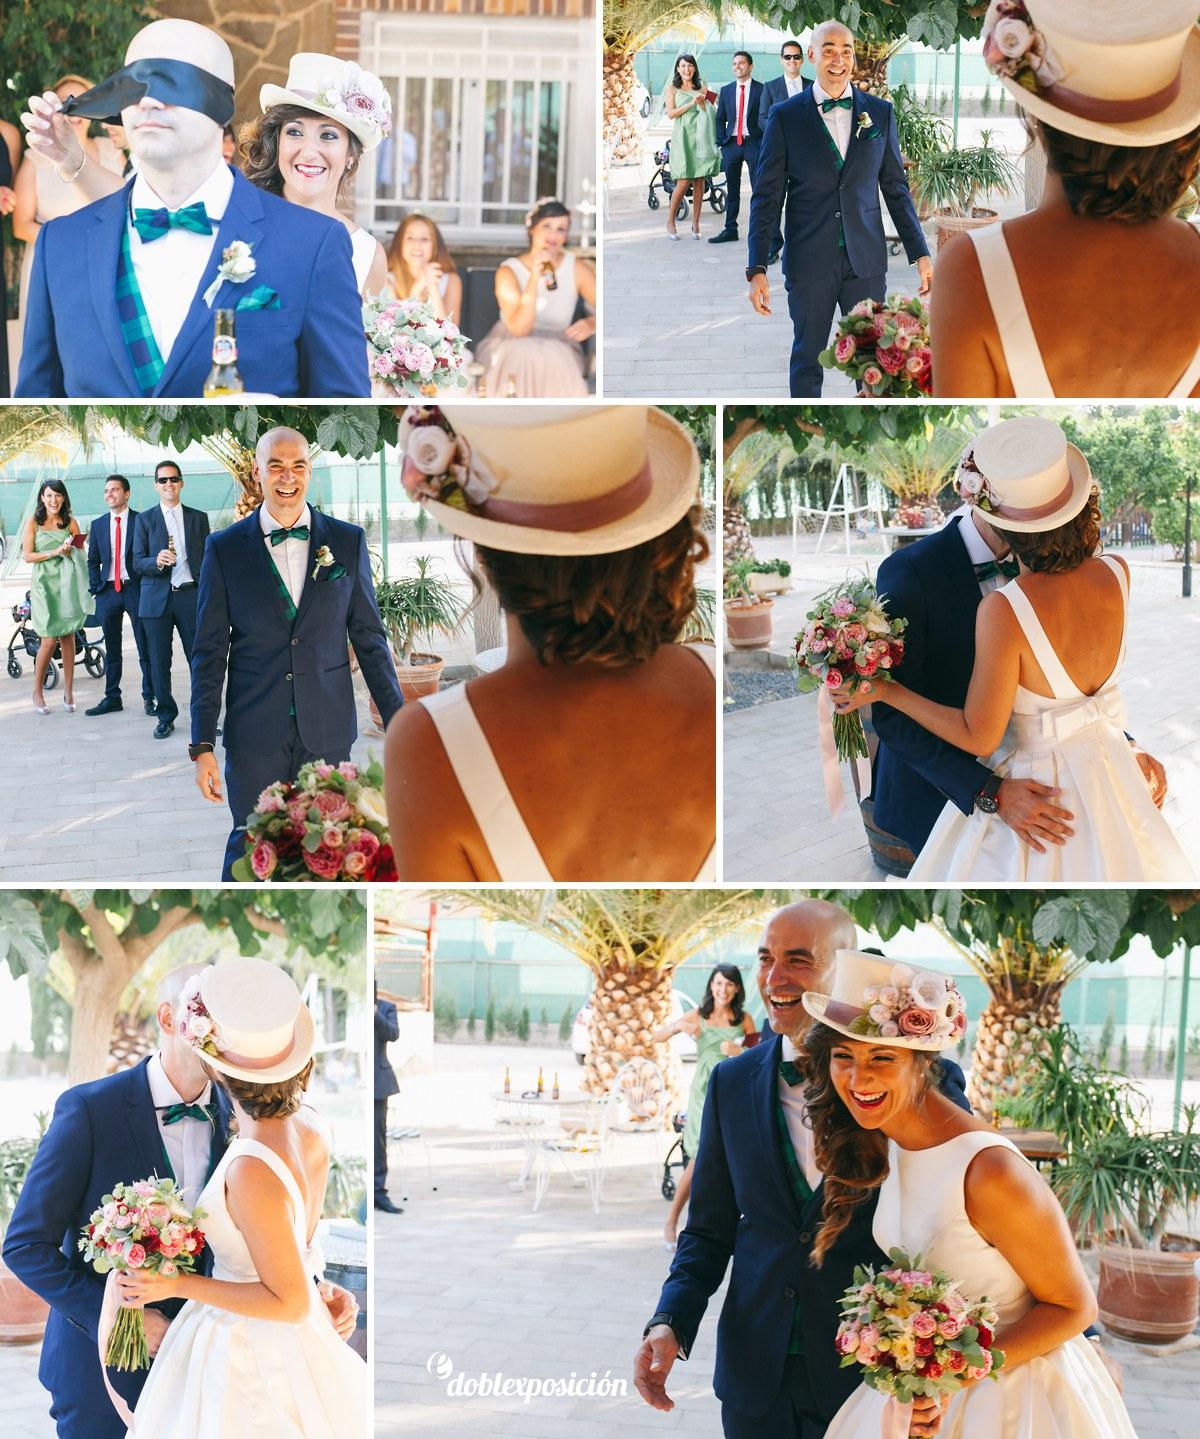 fotografos-boda-finca-restaurante-jardines-nou-cucuch-elche-novelda_0015